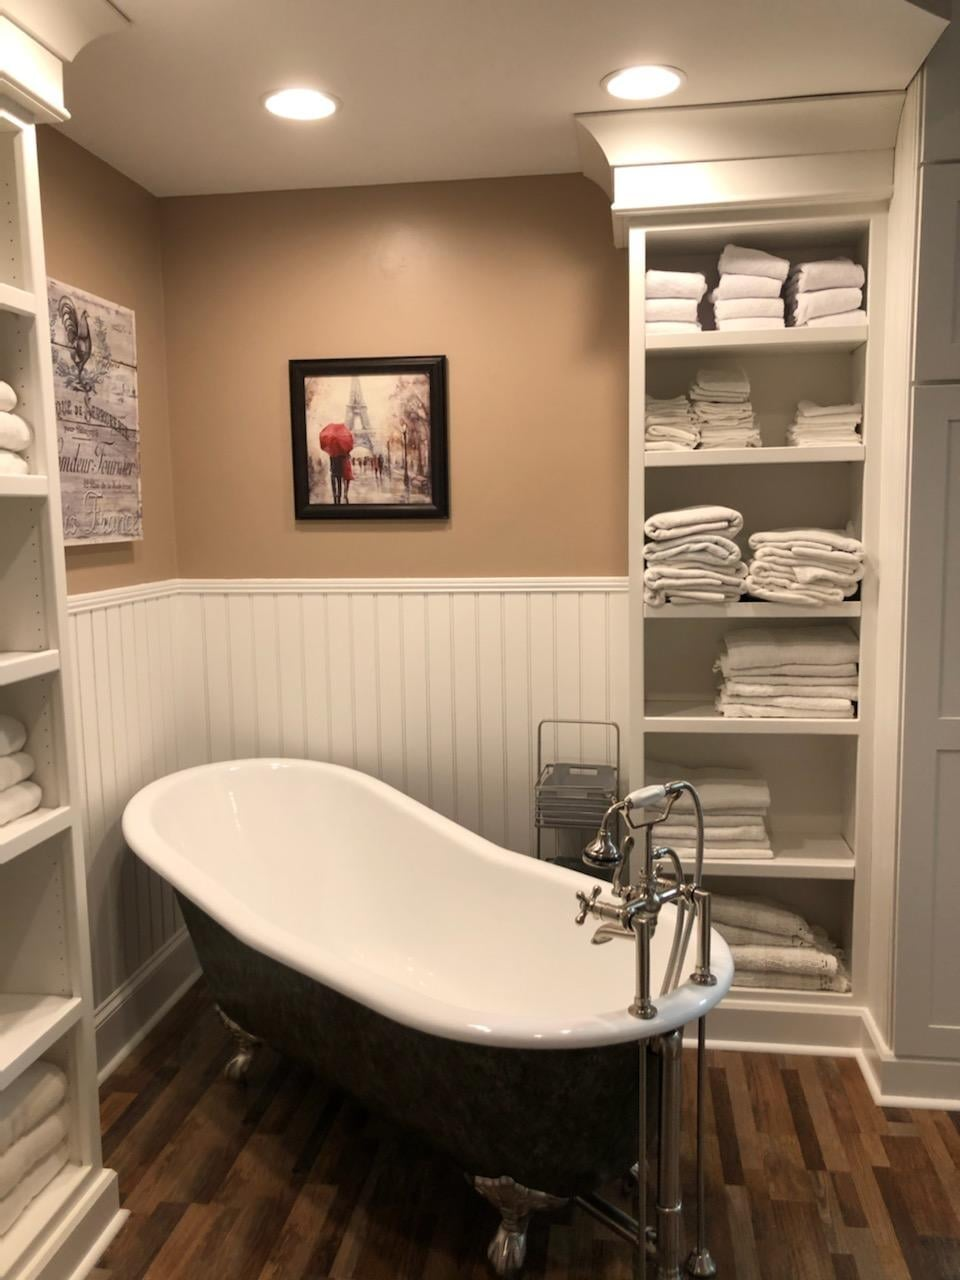 Bathroom remodel in Concord, NC from Custom Floor Solutions